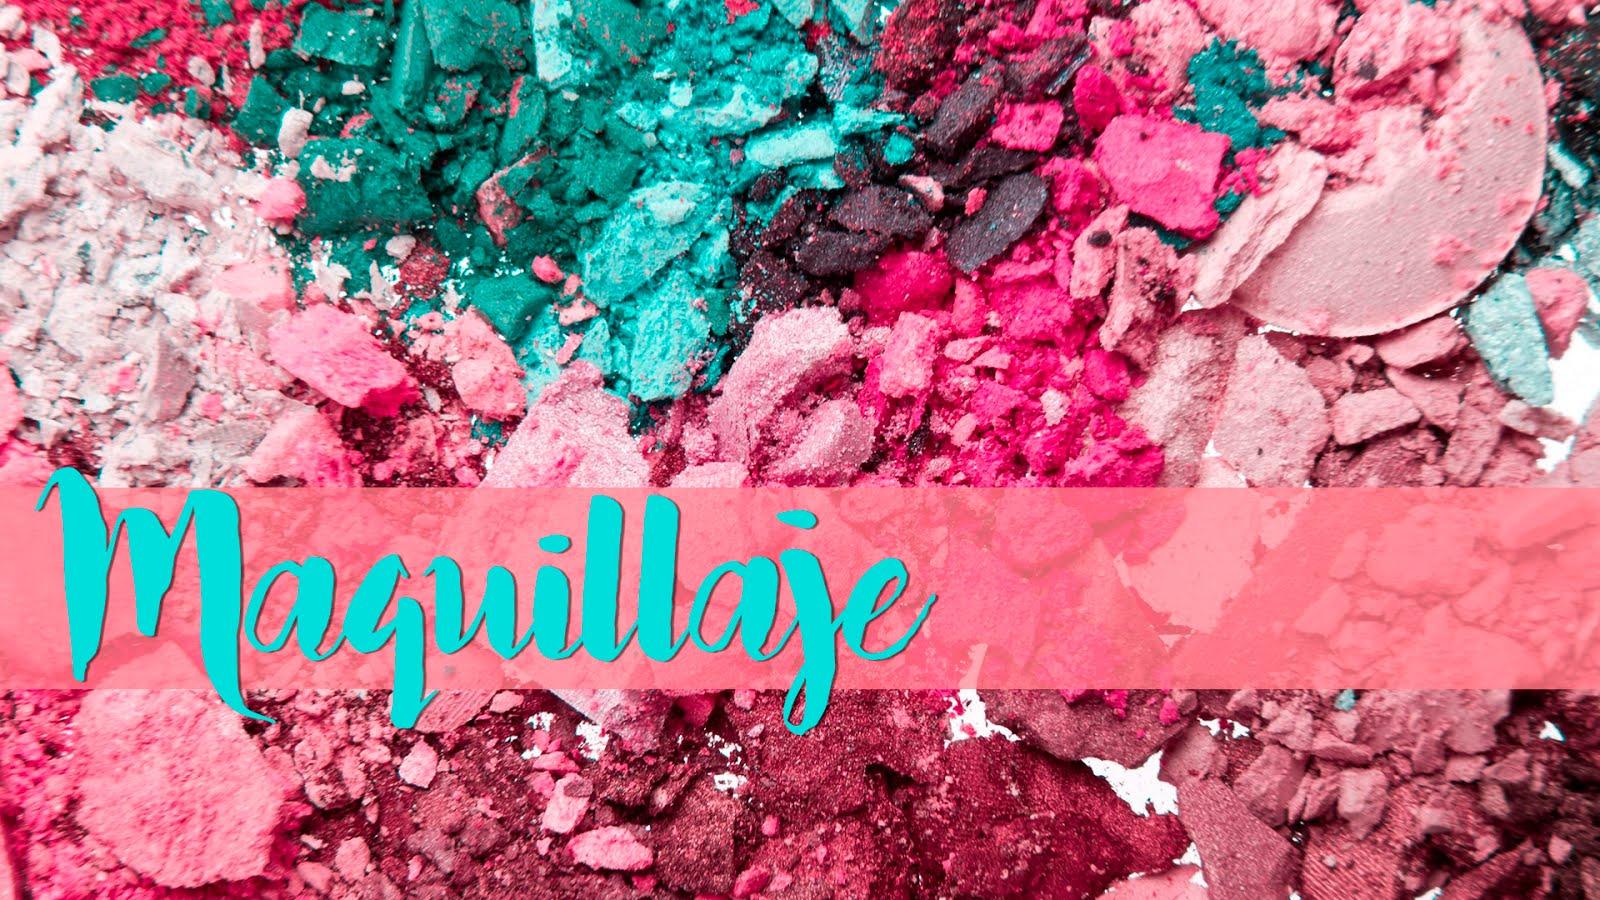 http://www.bridacoelho.com/search/label/Maquillaje